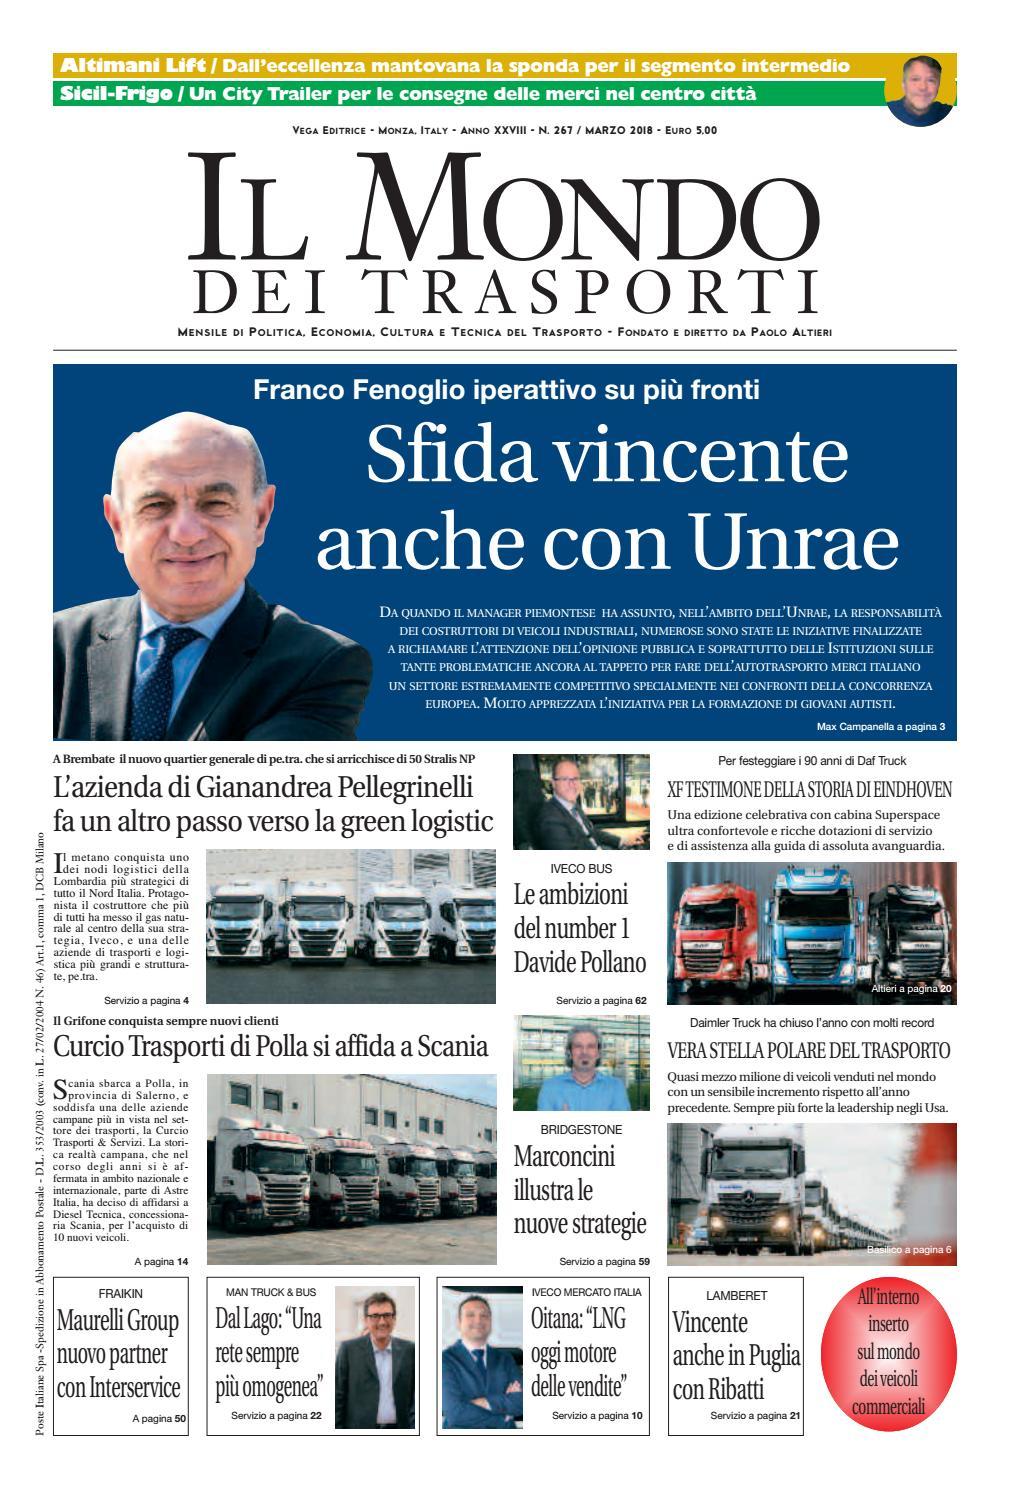 Il Mondo dei Trasporti Marzo 2018 by Vega Editrice - issuu eef2bac2c146